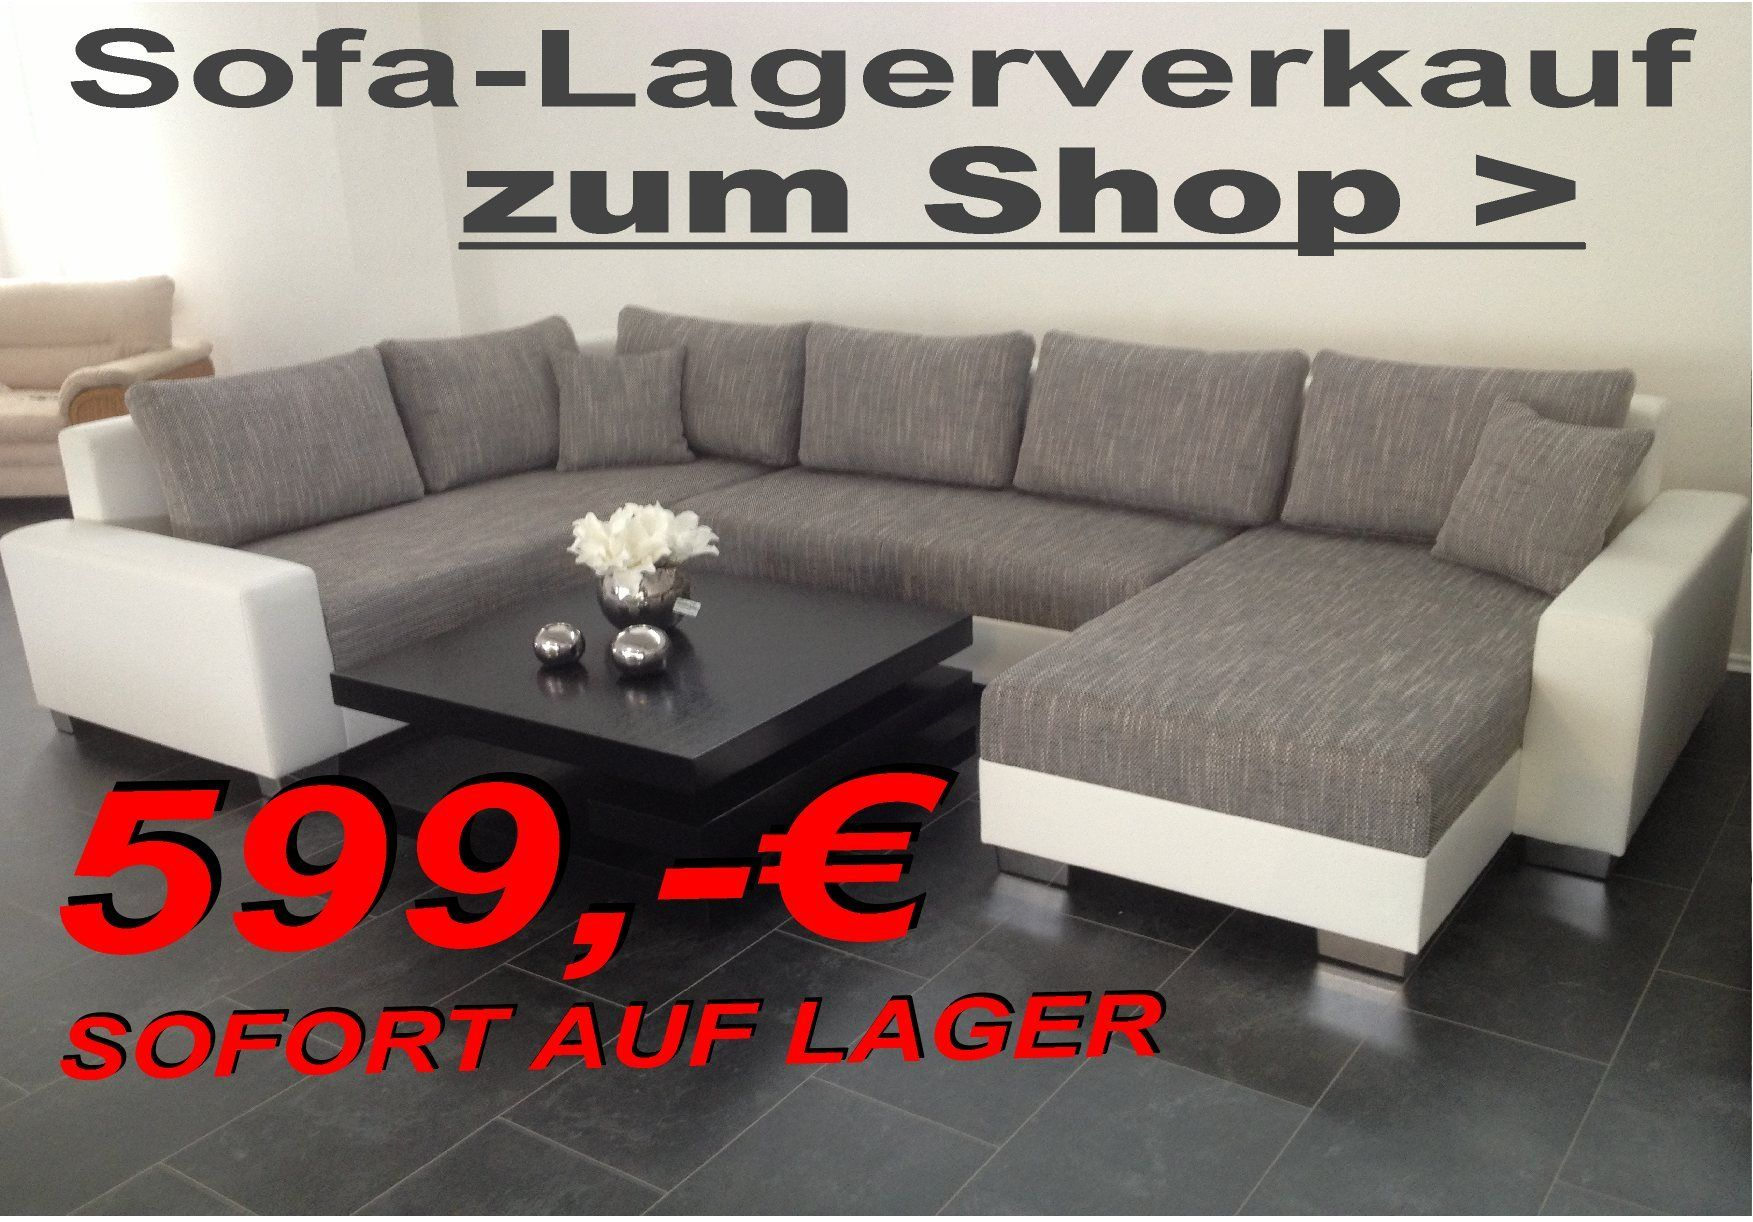 Sofa Kaufen Gunstig ~ Möbel günstig kaufen sofa lagerverkauf sofa lagerverkauf